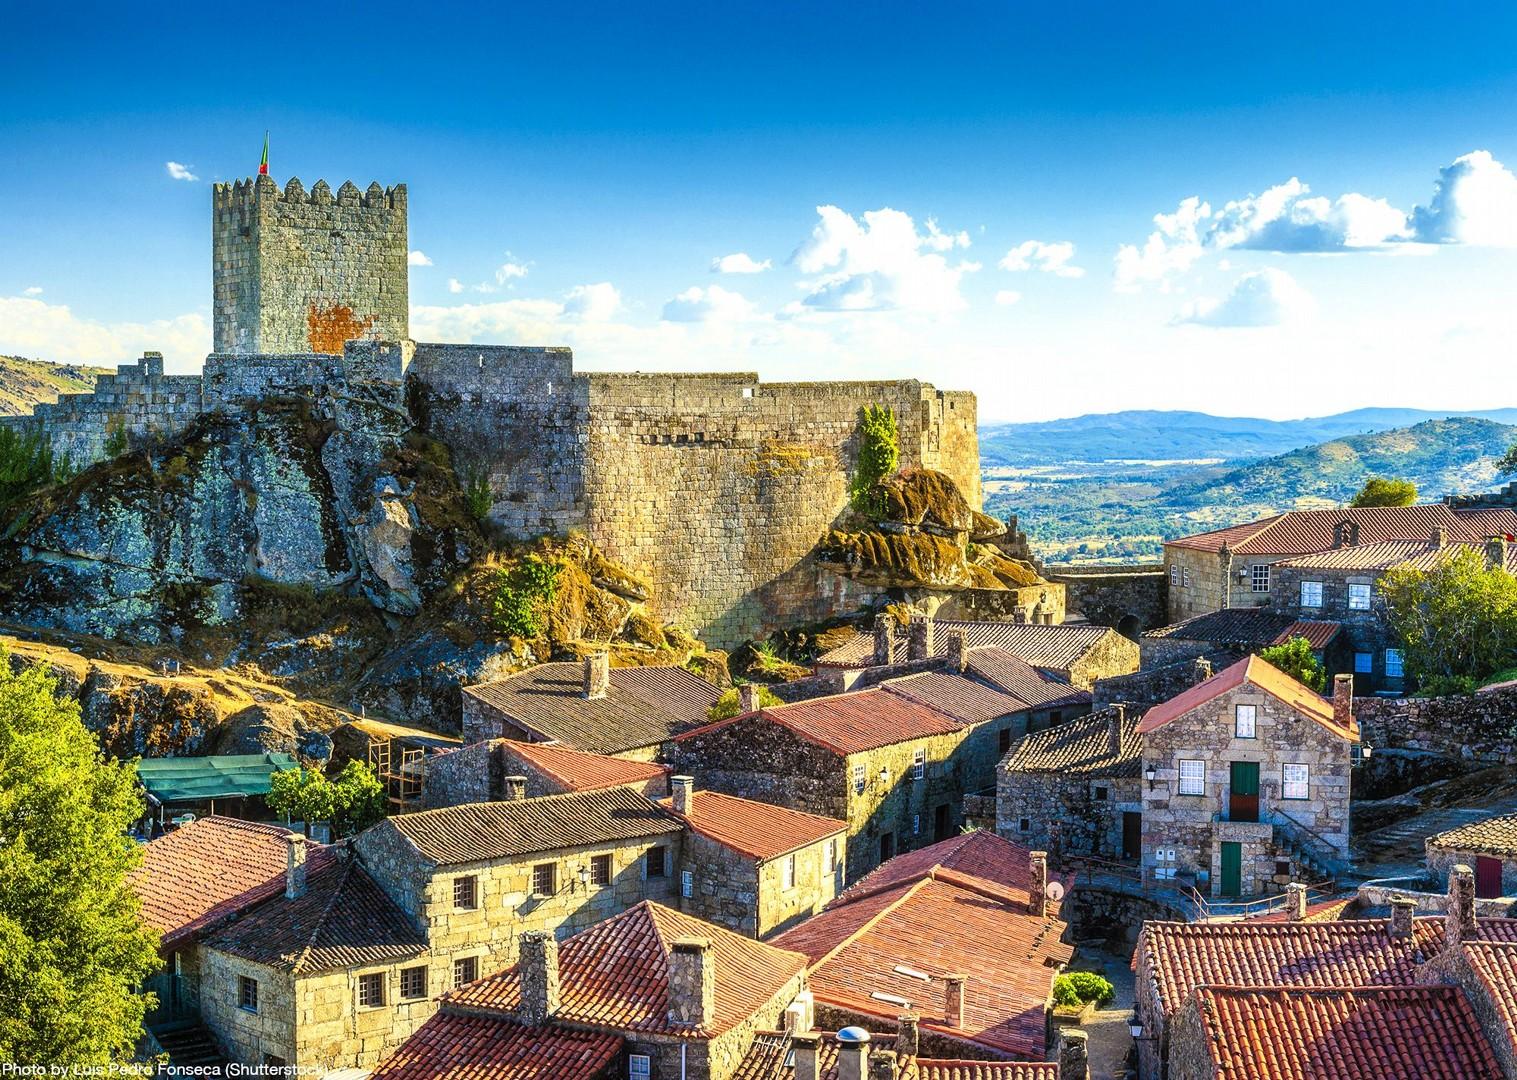 aldeias-historicas-portugal-bike-tour-marvao-castle-cycling-holiday.jpg - Portugal - Historic Villages - Self-Guided Leisure Cycling Holiday - Leisure Cycling